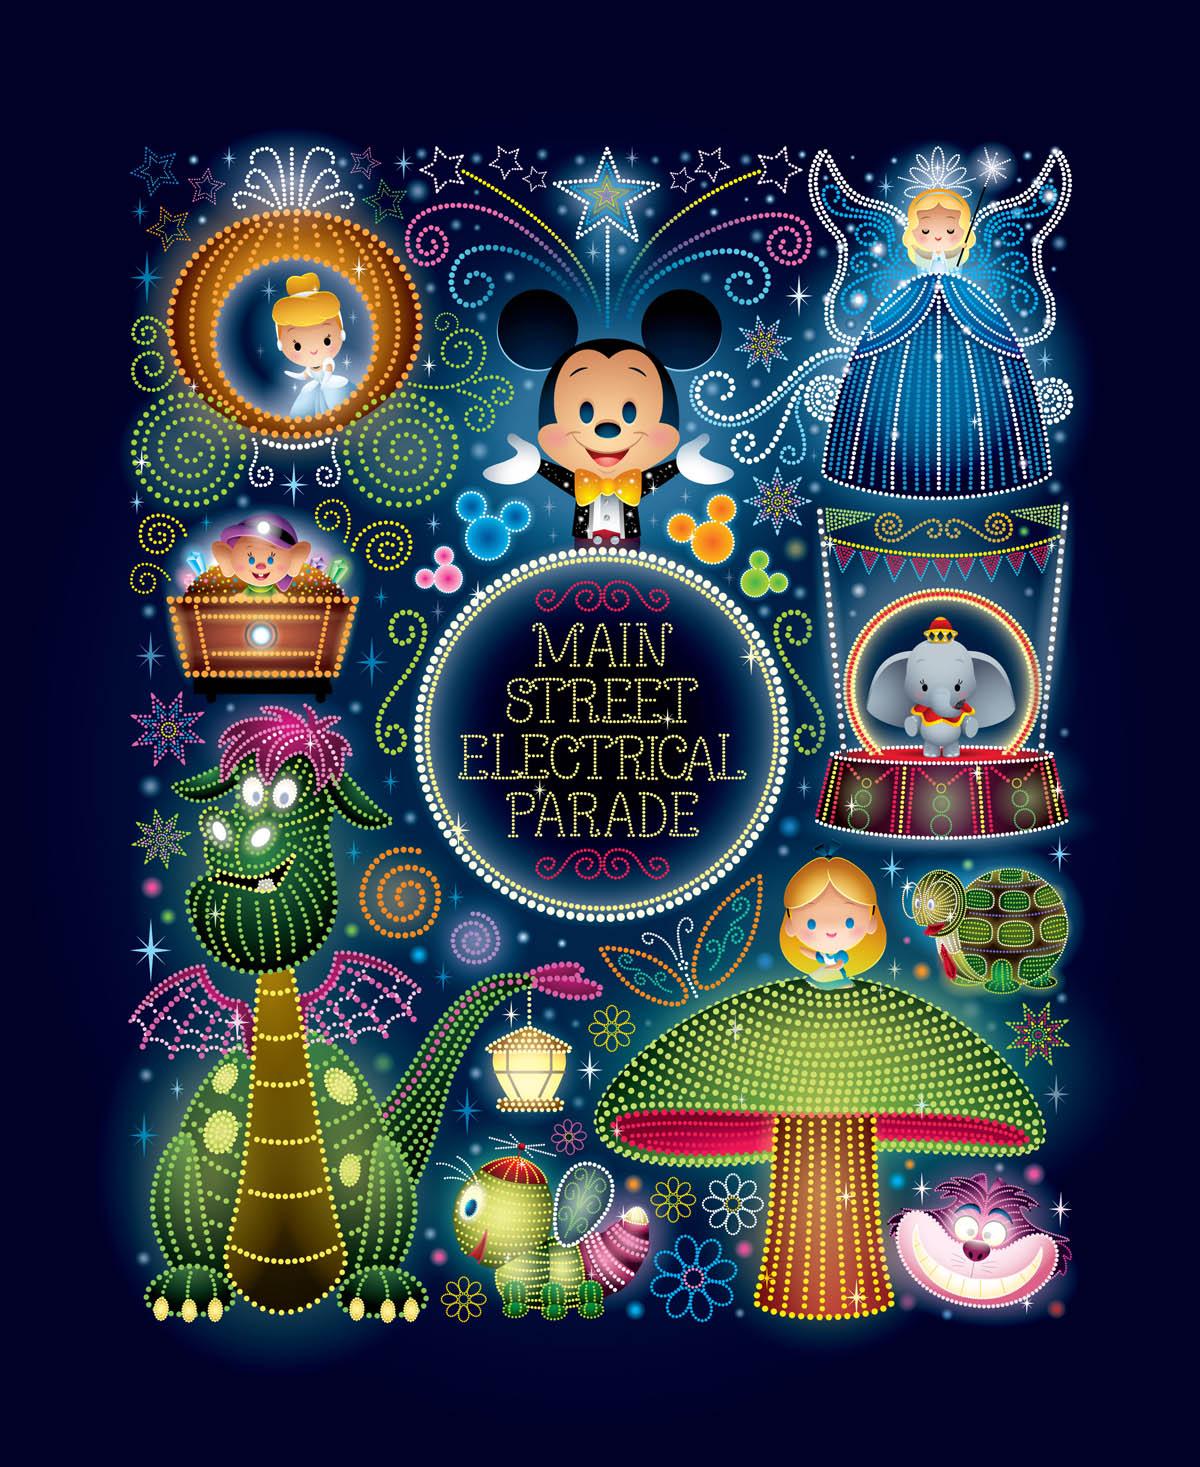 NighttimeMagic_Maruyama_Disney.jpg